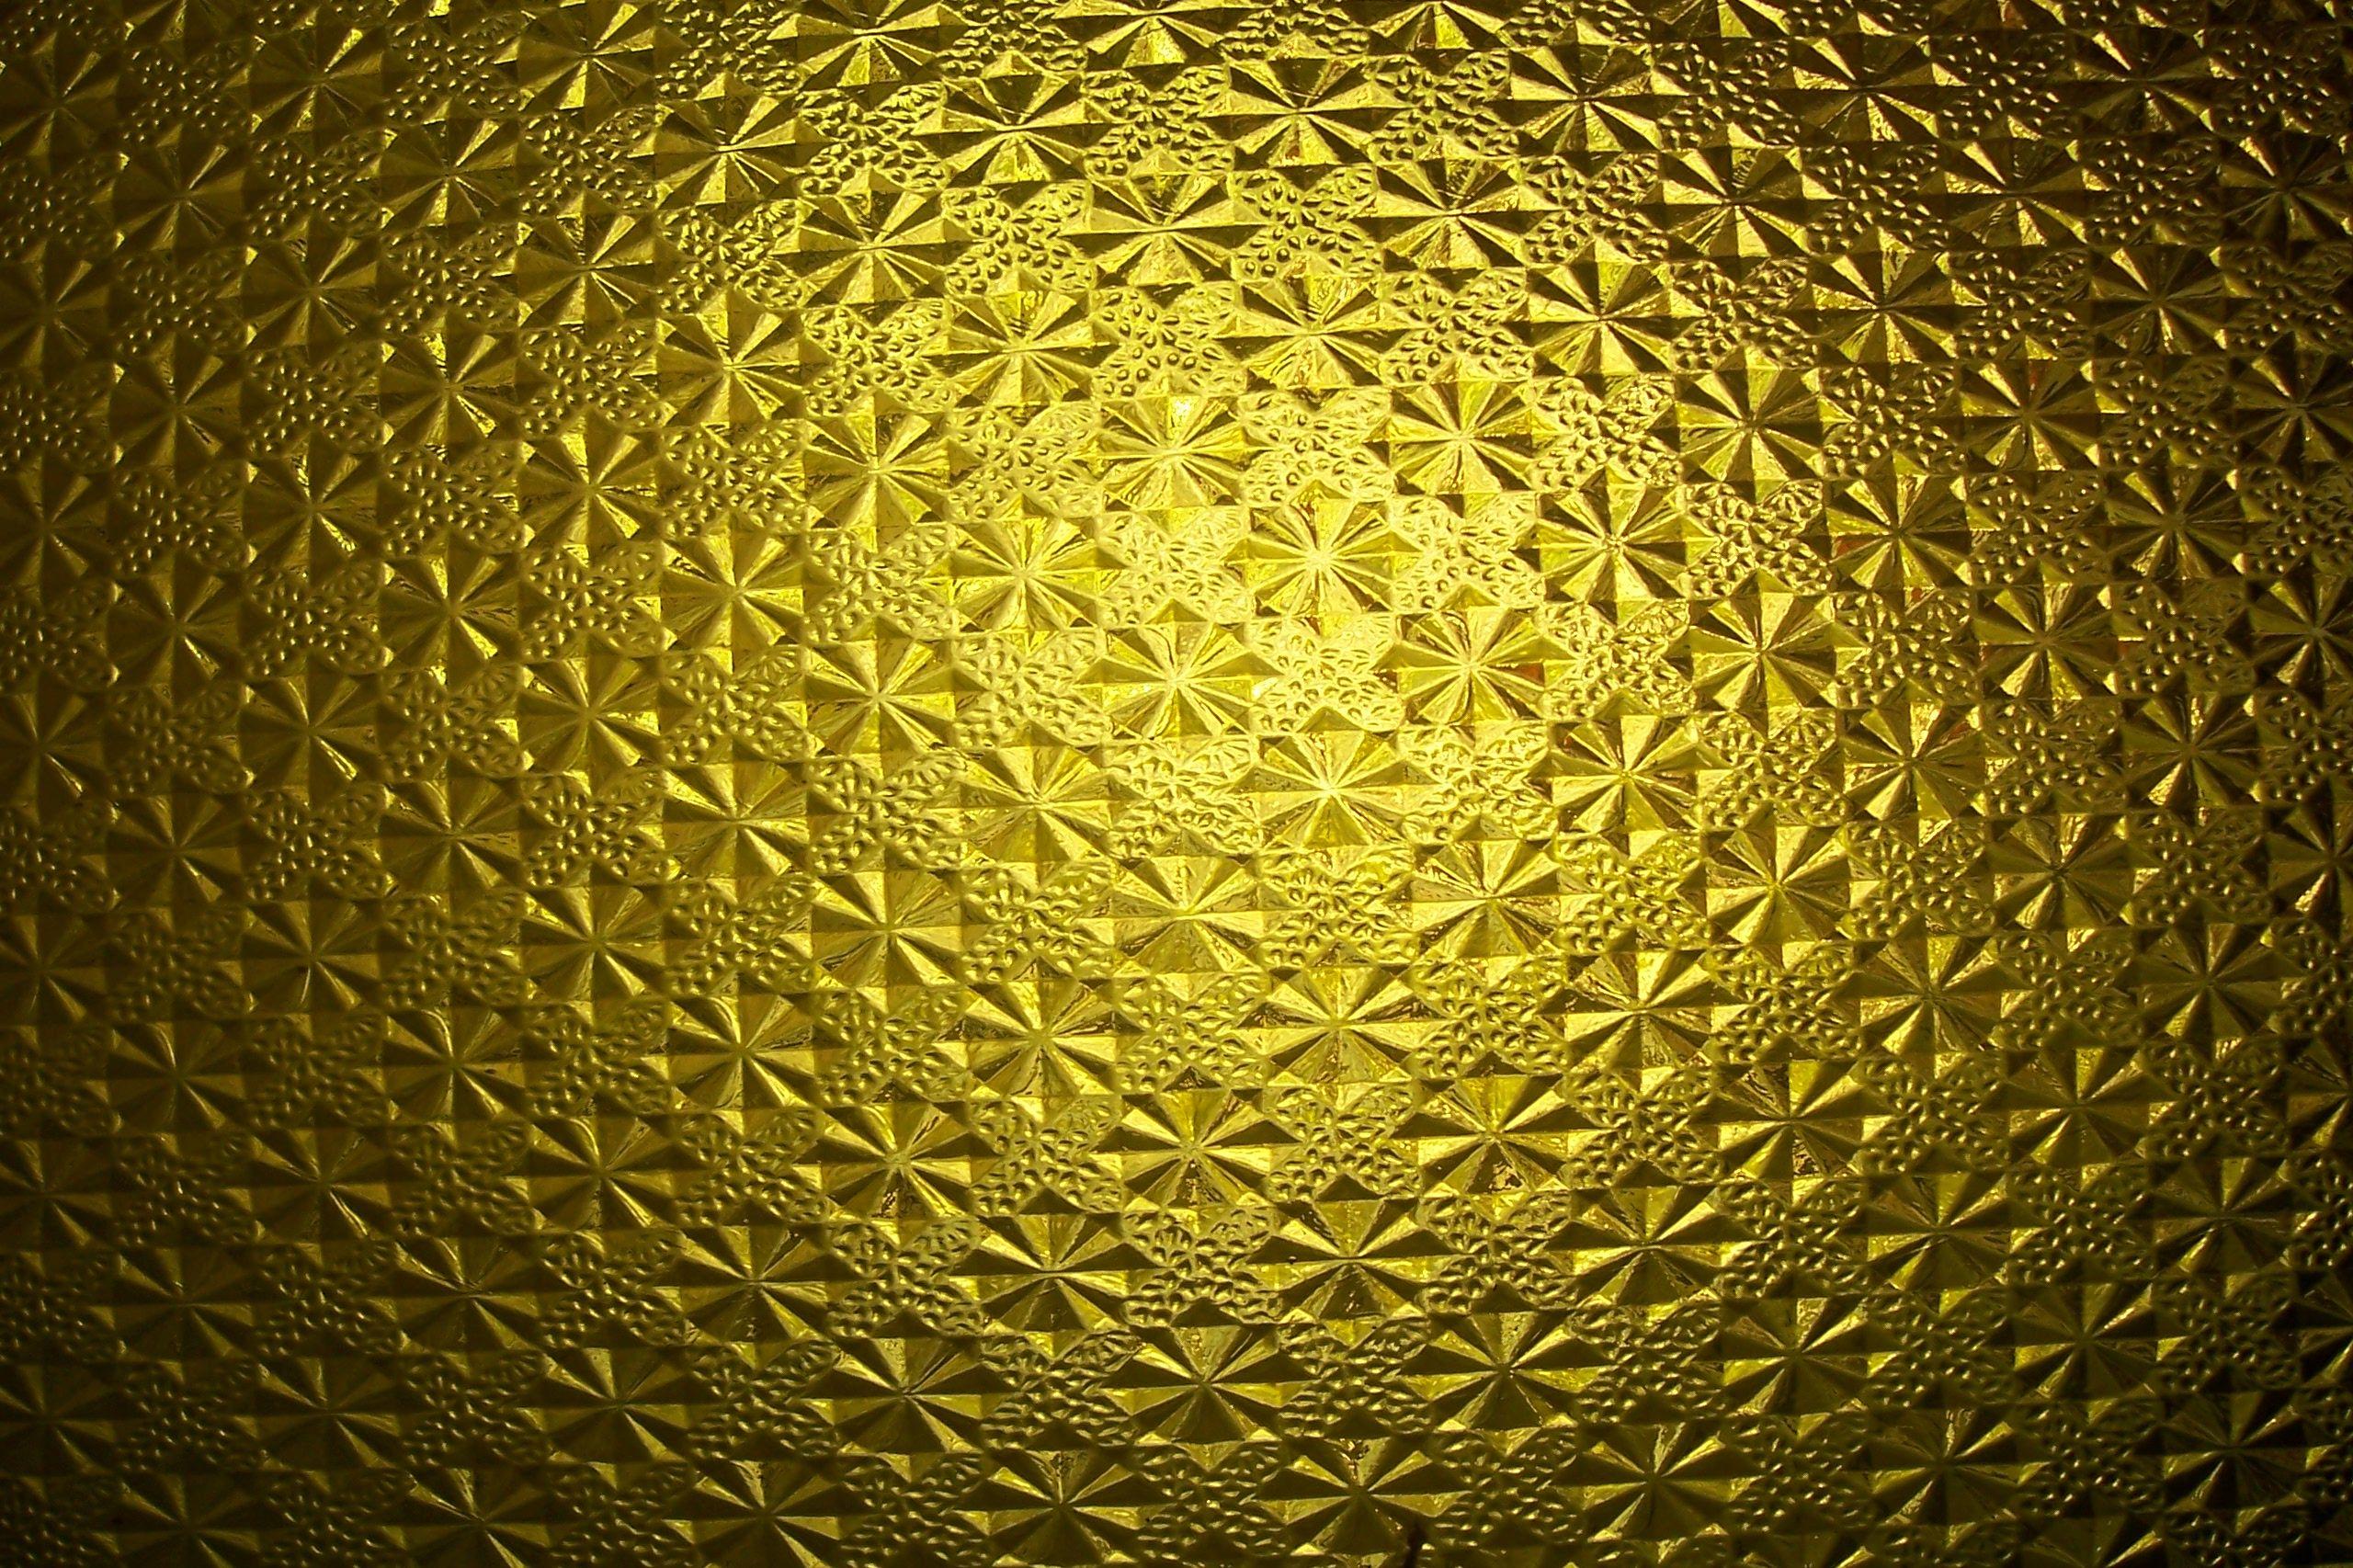 Patterns Gold Textures High Quality In HD Wallpaper Desktop